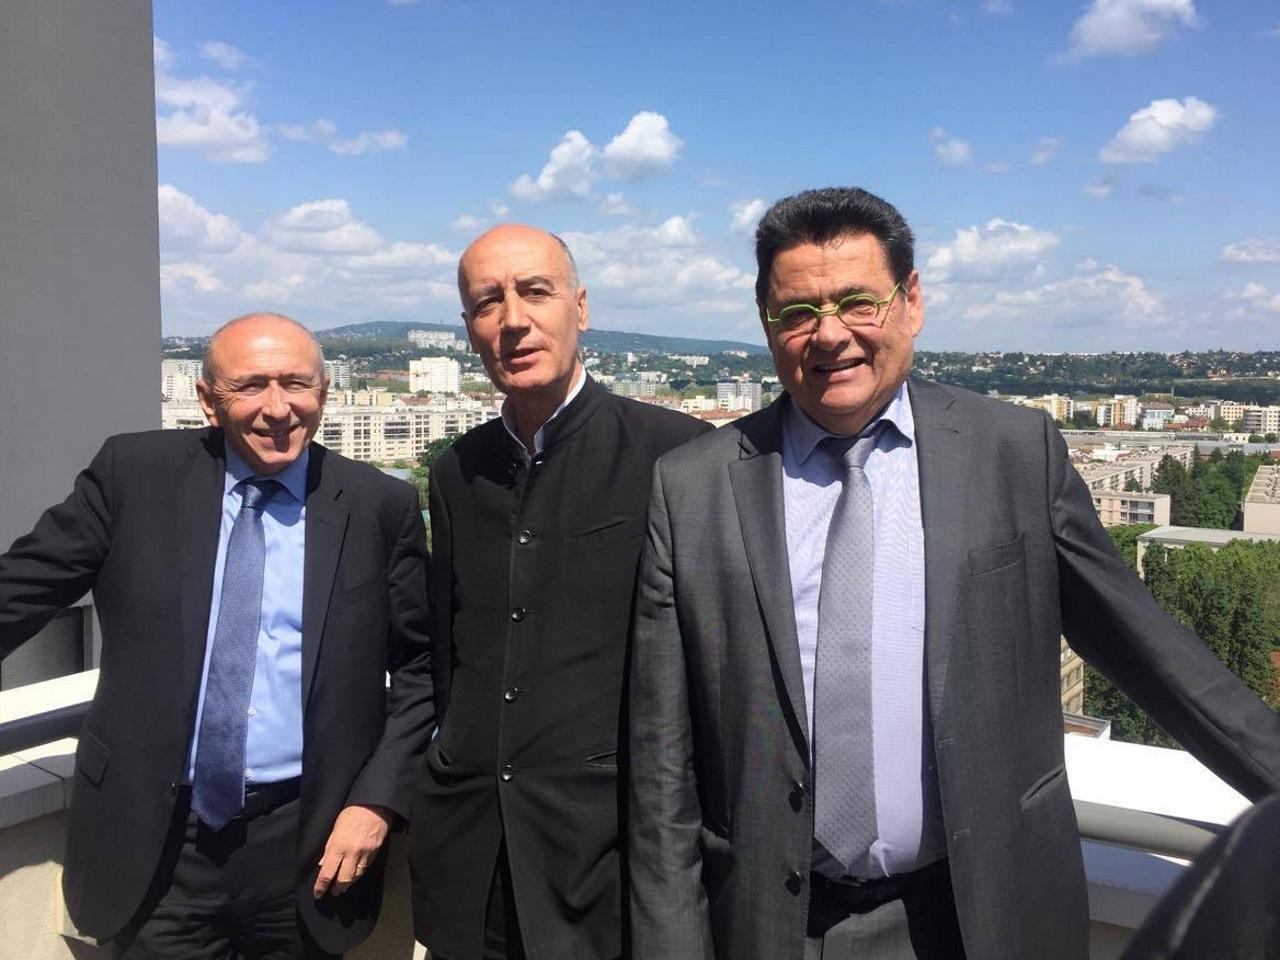 Gérard Collomb, Nicolas Michelin et Jean-Paul Bret - LyonMag